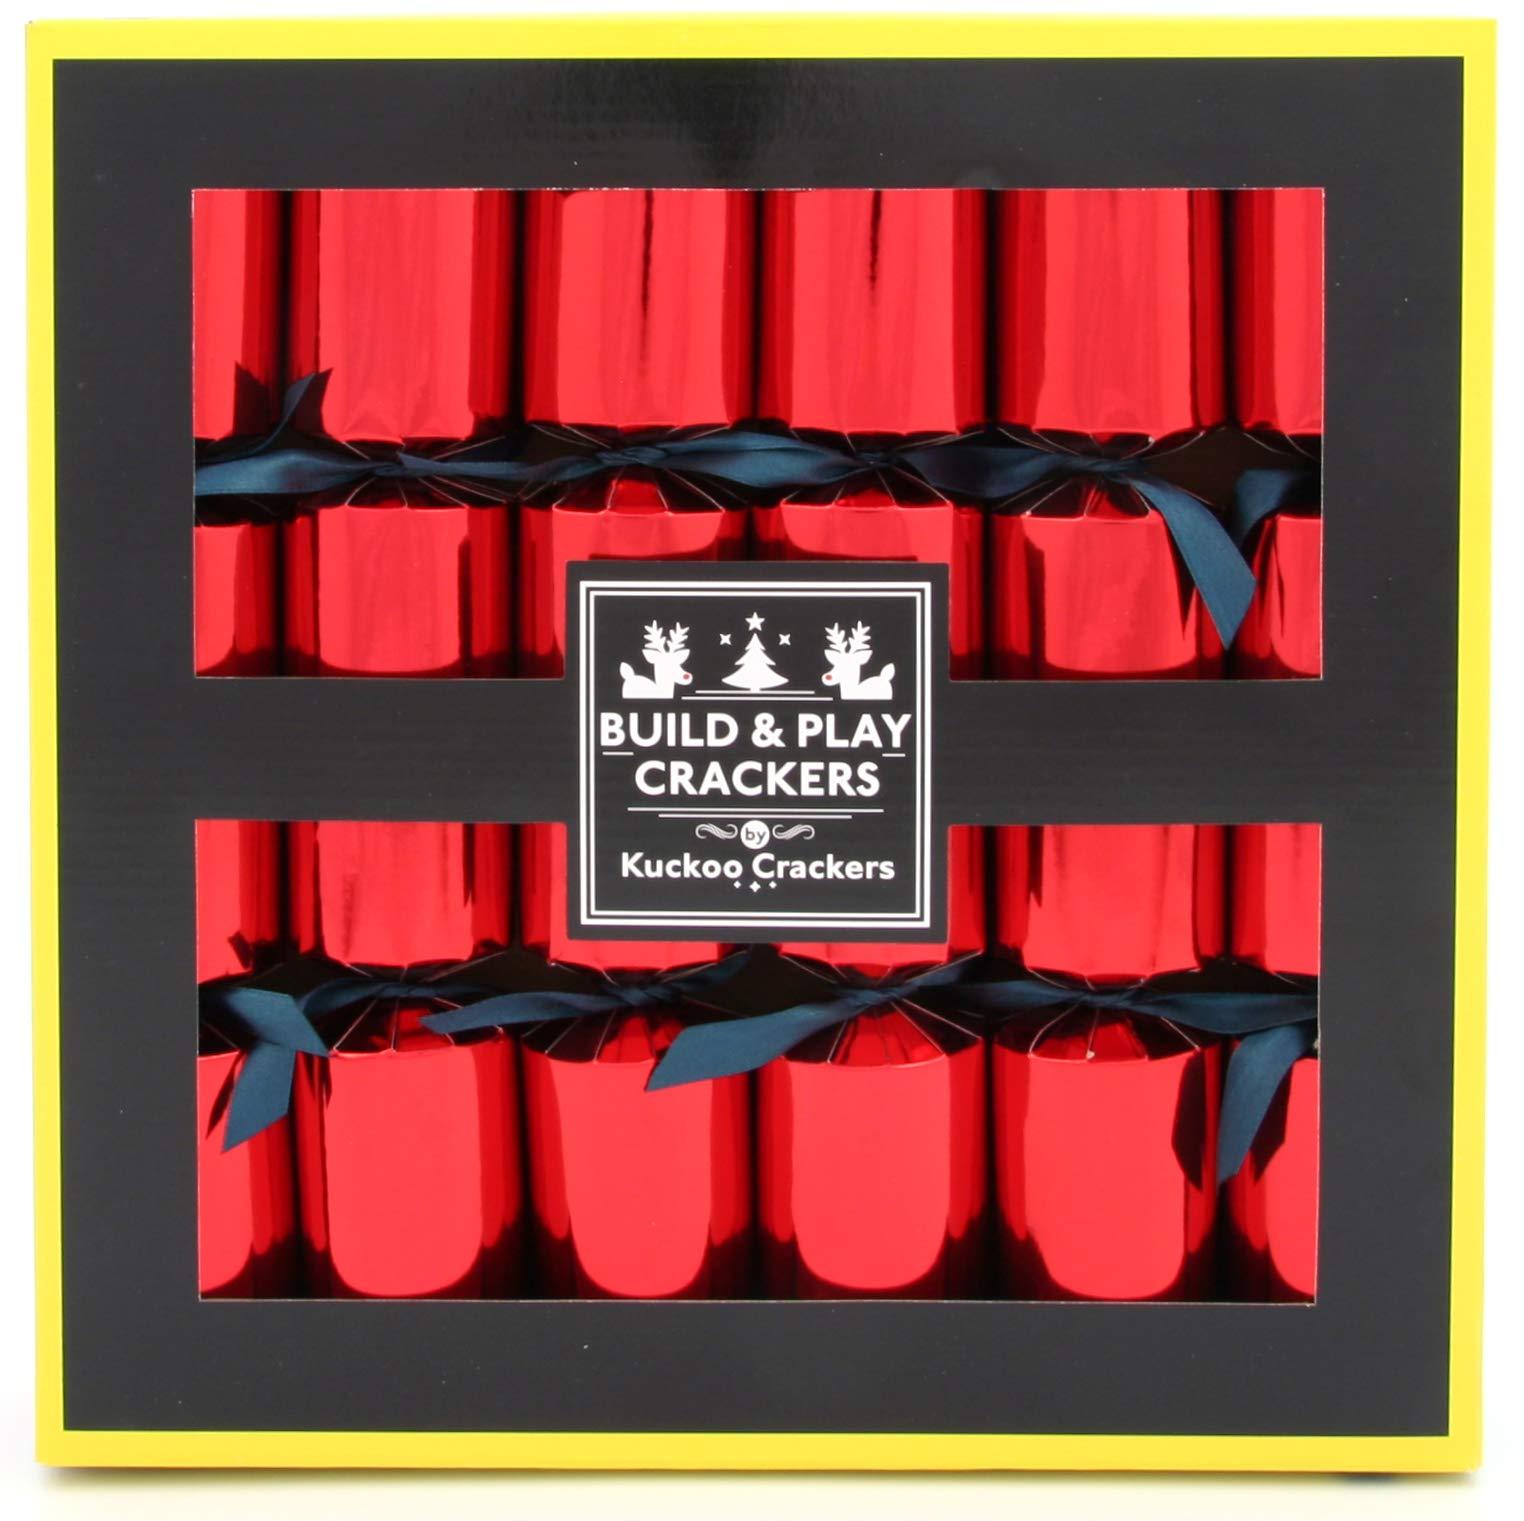 Kuckoo Crackers - 6 x 12-inch Build & Play Animal Building Block Christmas Crackers